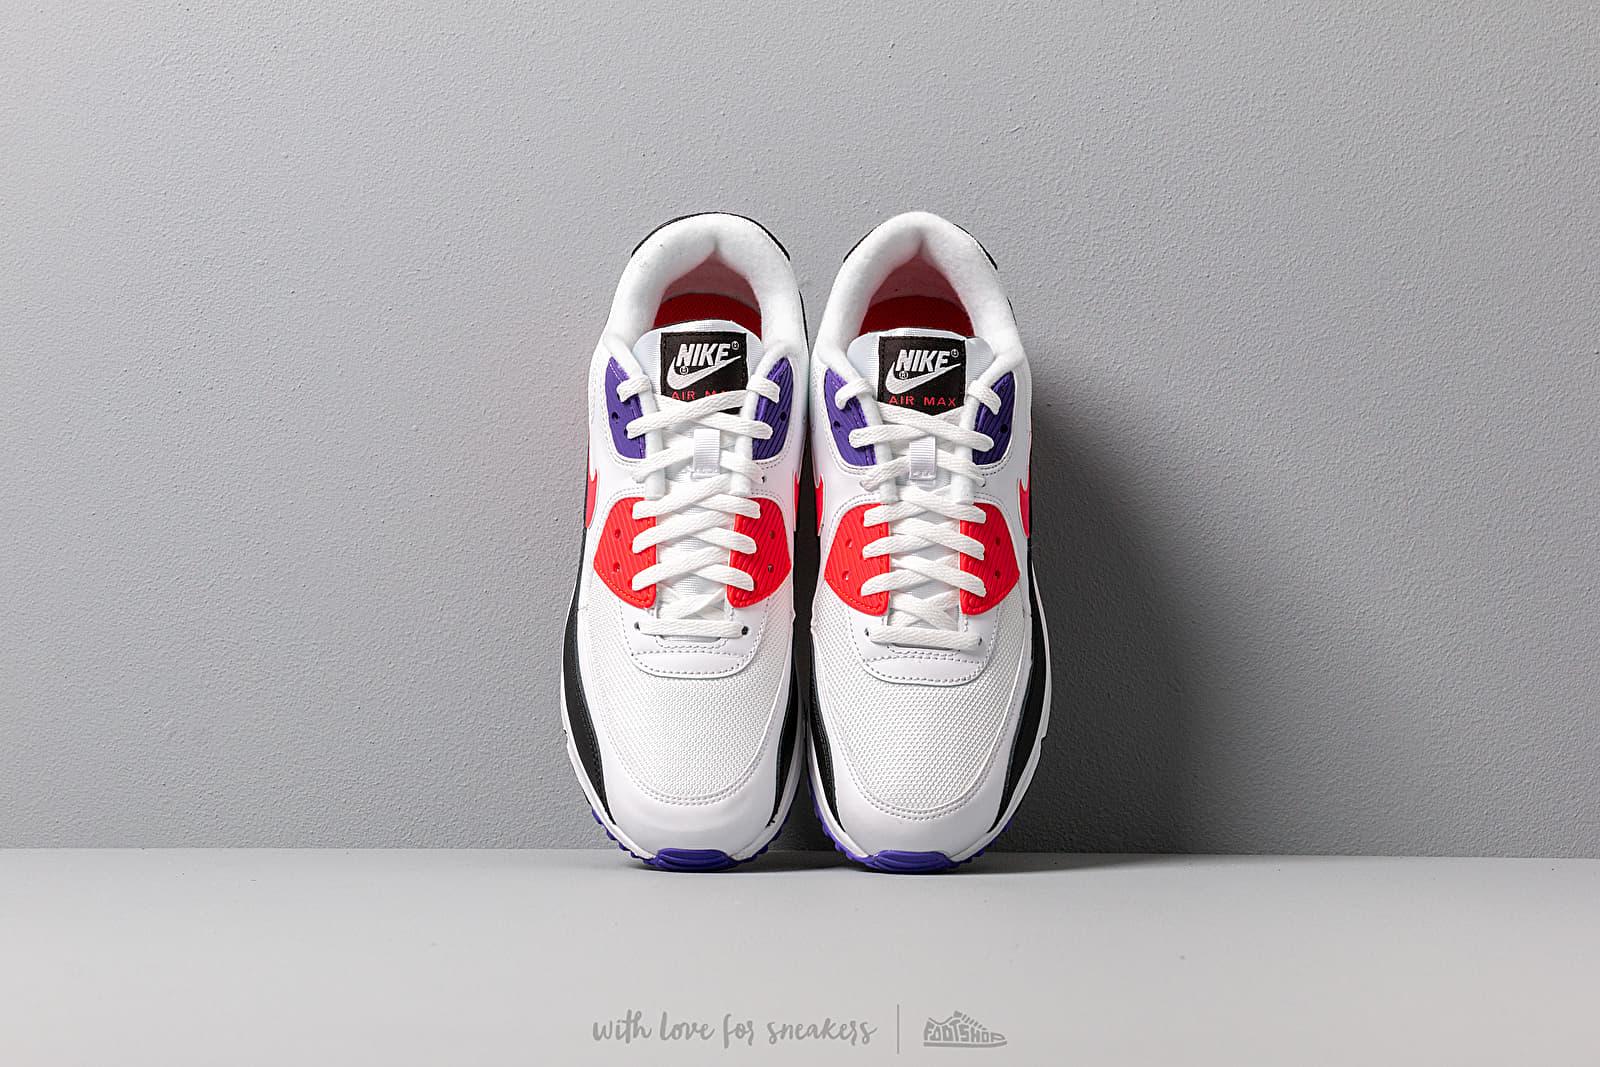 Tenis Nike Air Max '90 Essential Shoe White Red orbit